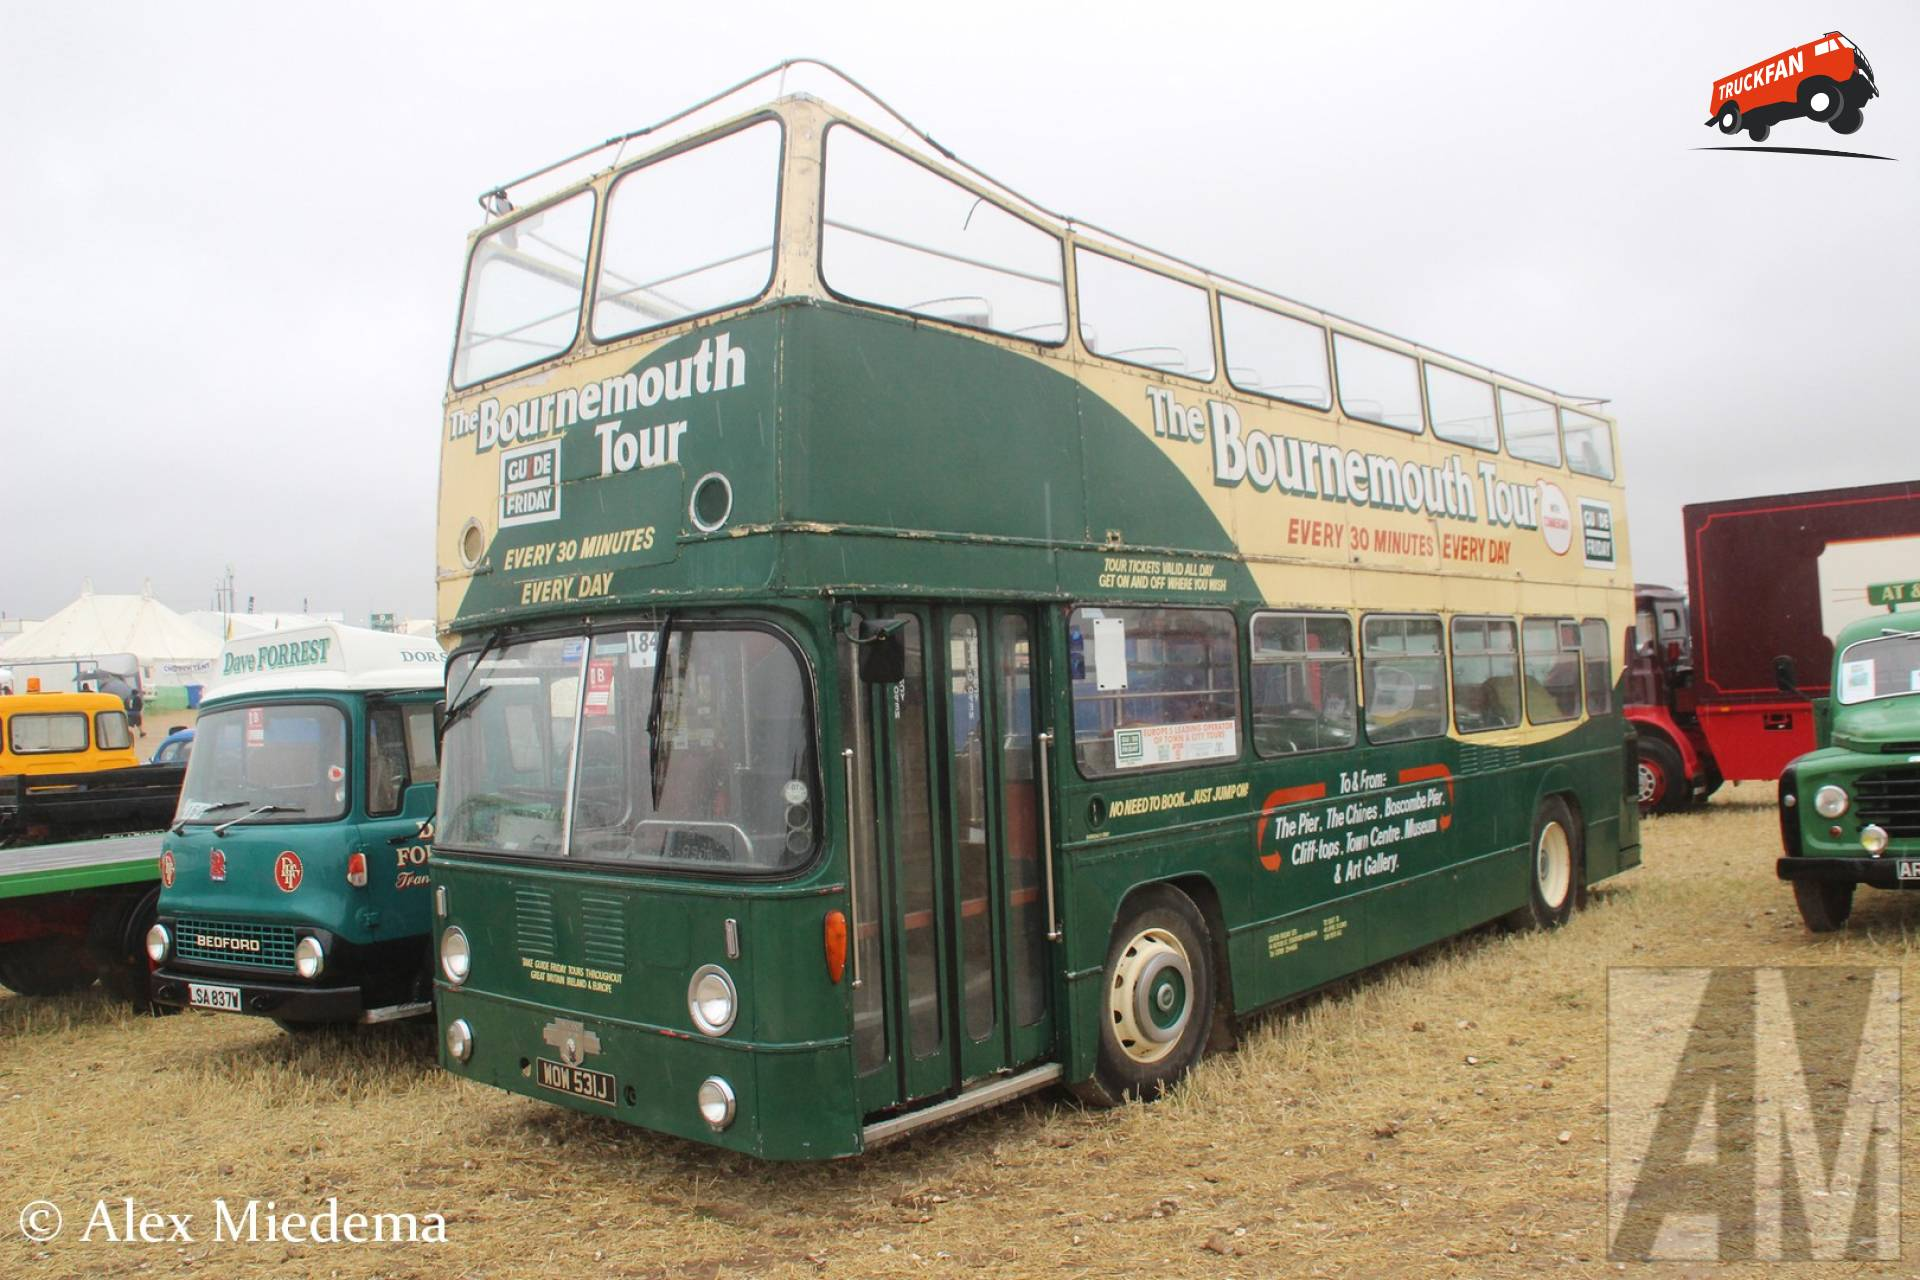 Leyland buschassis